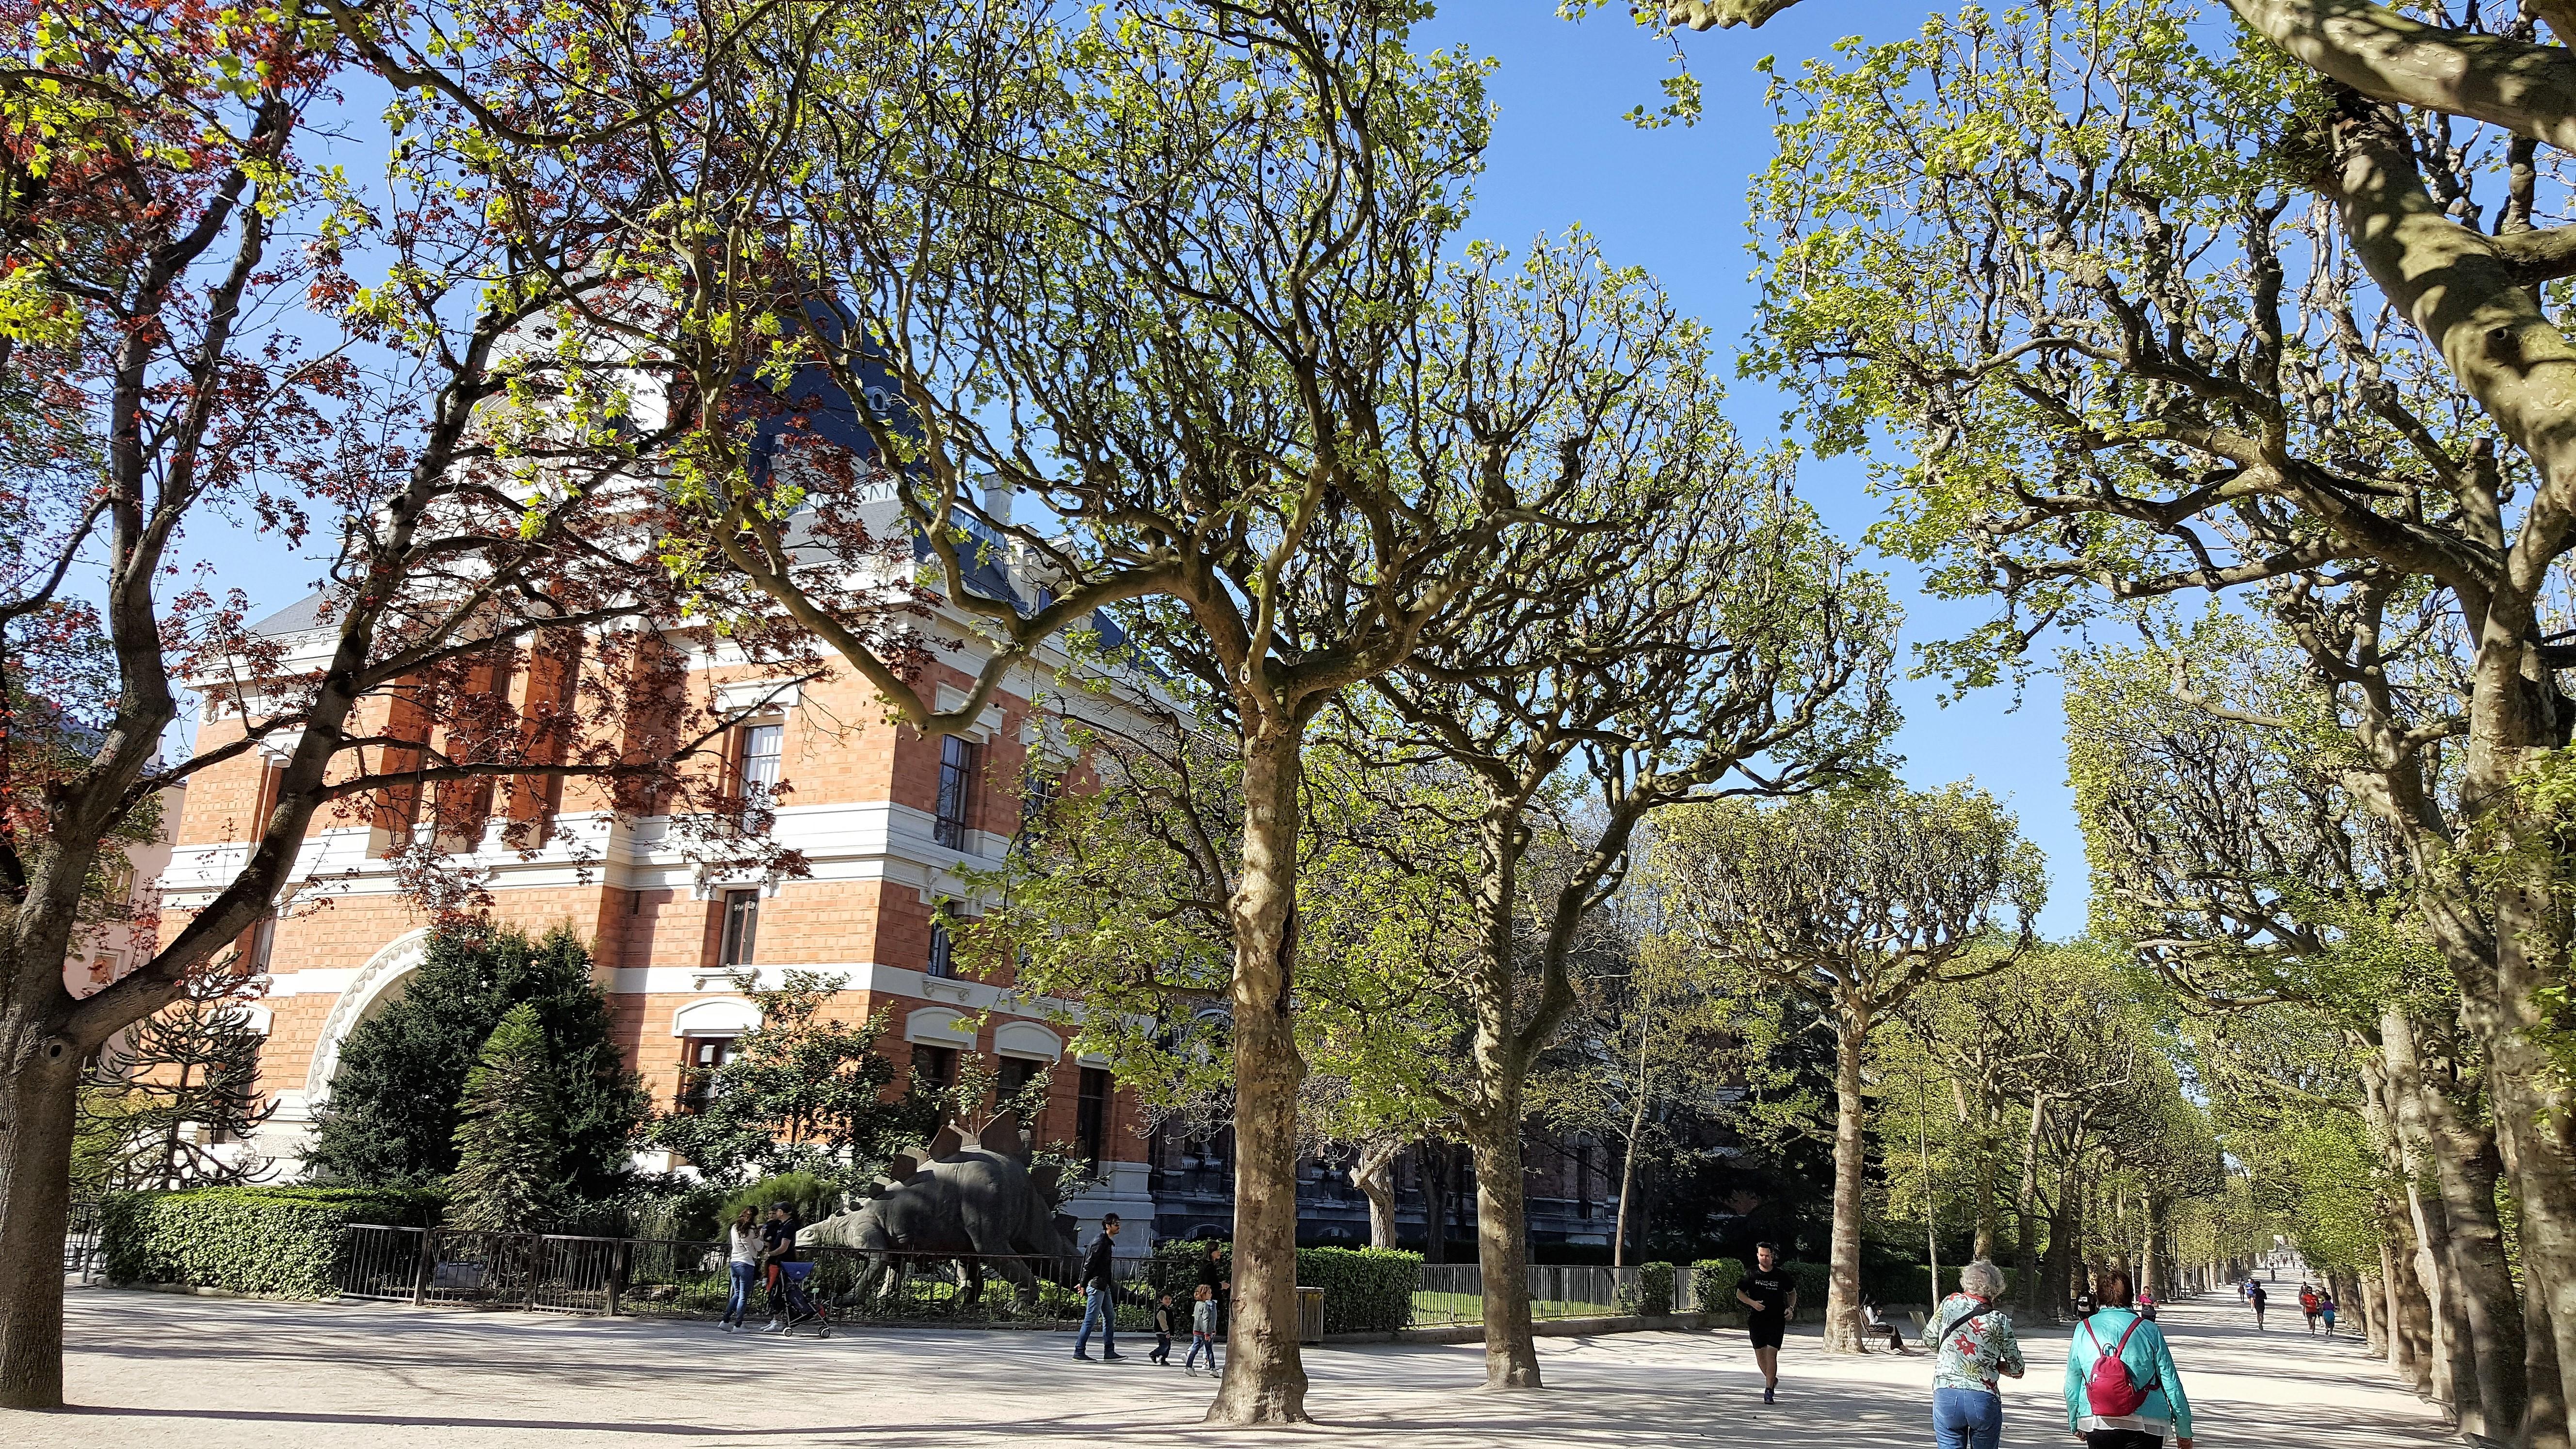 Une city rando pour l 39 arriv e du printemps un for Le jardin tino rossi